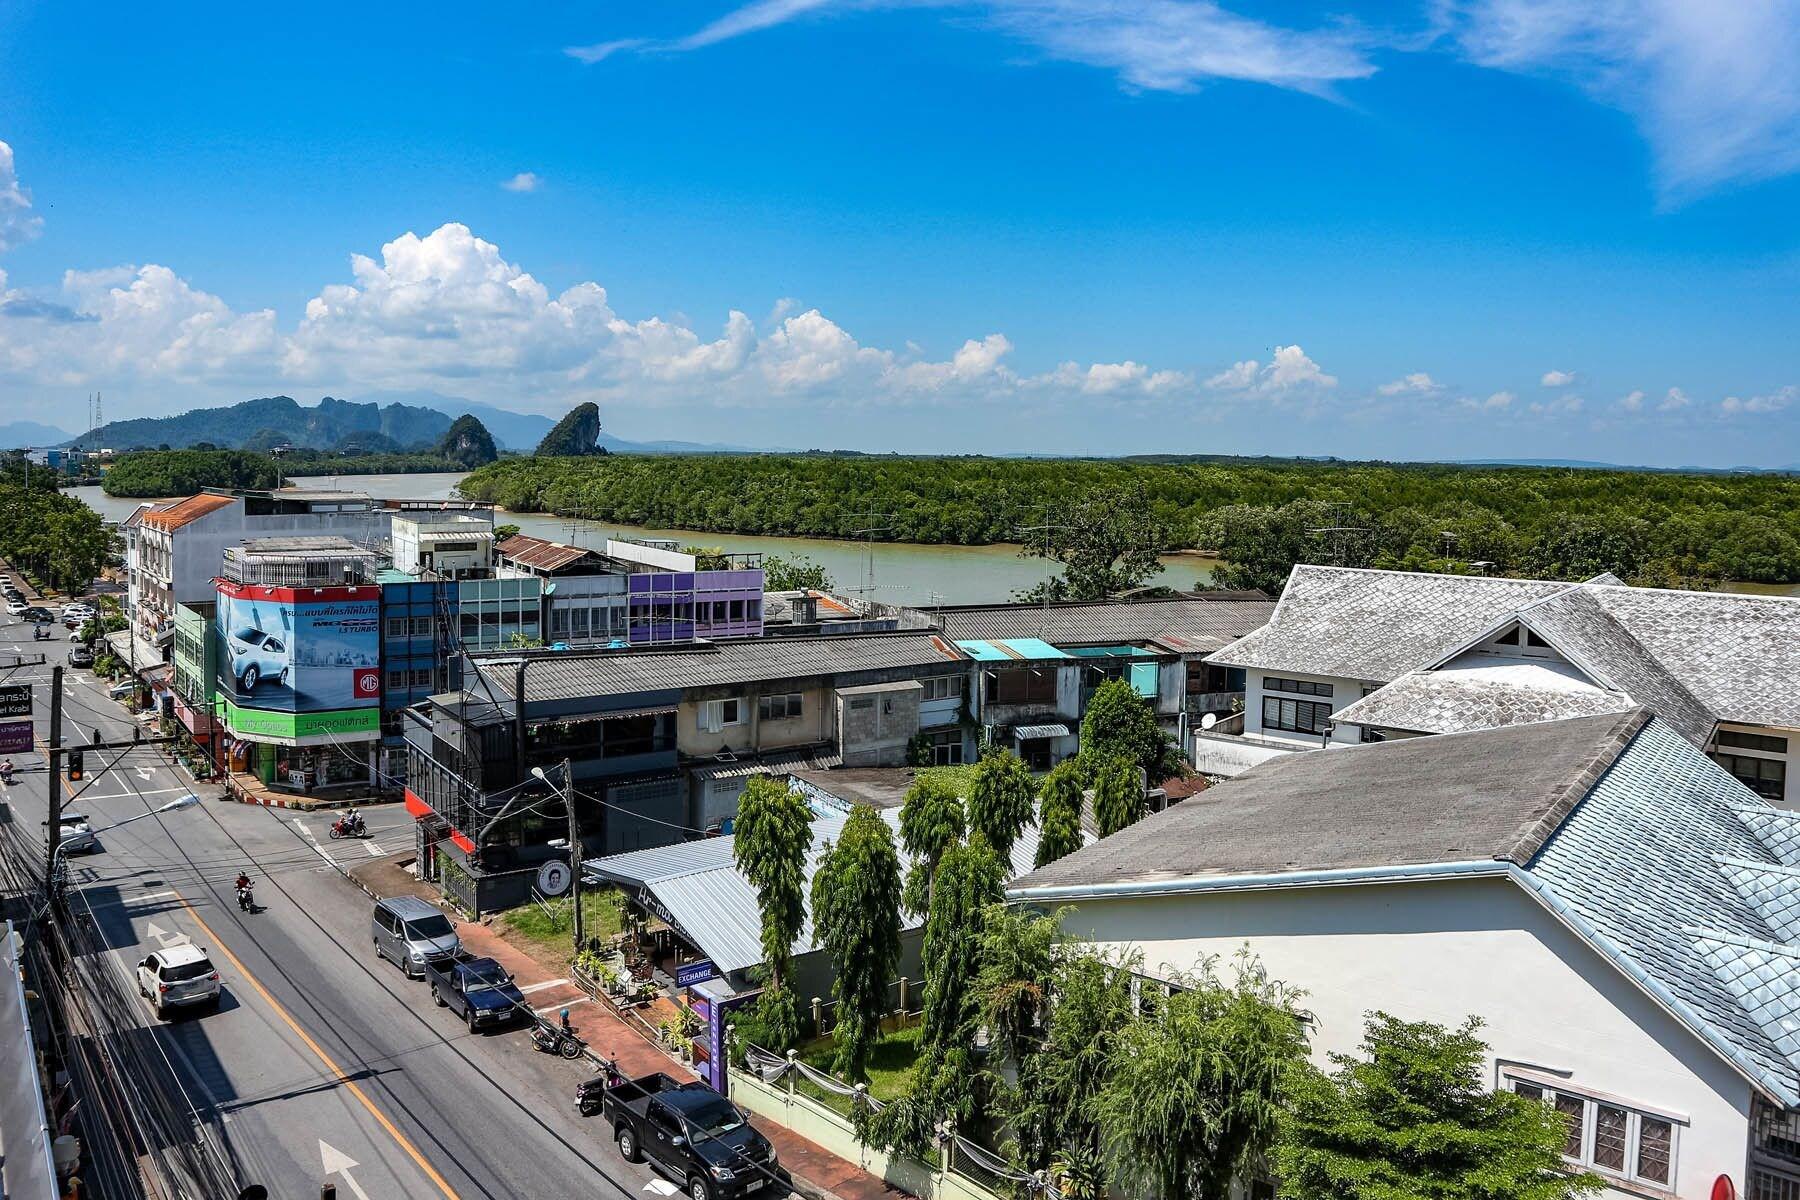 Pak-Up Hostel, Muang Krabi